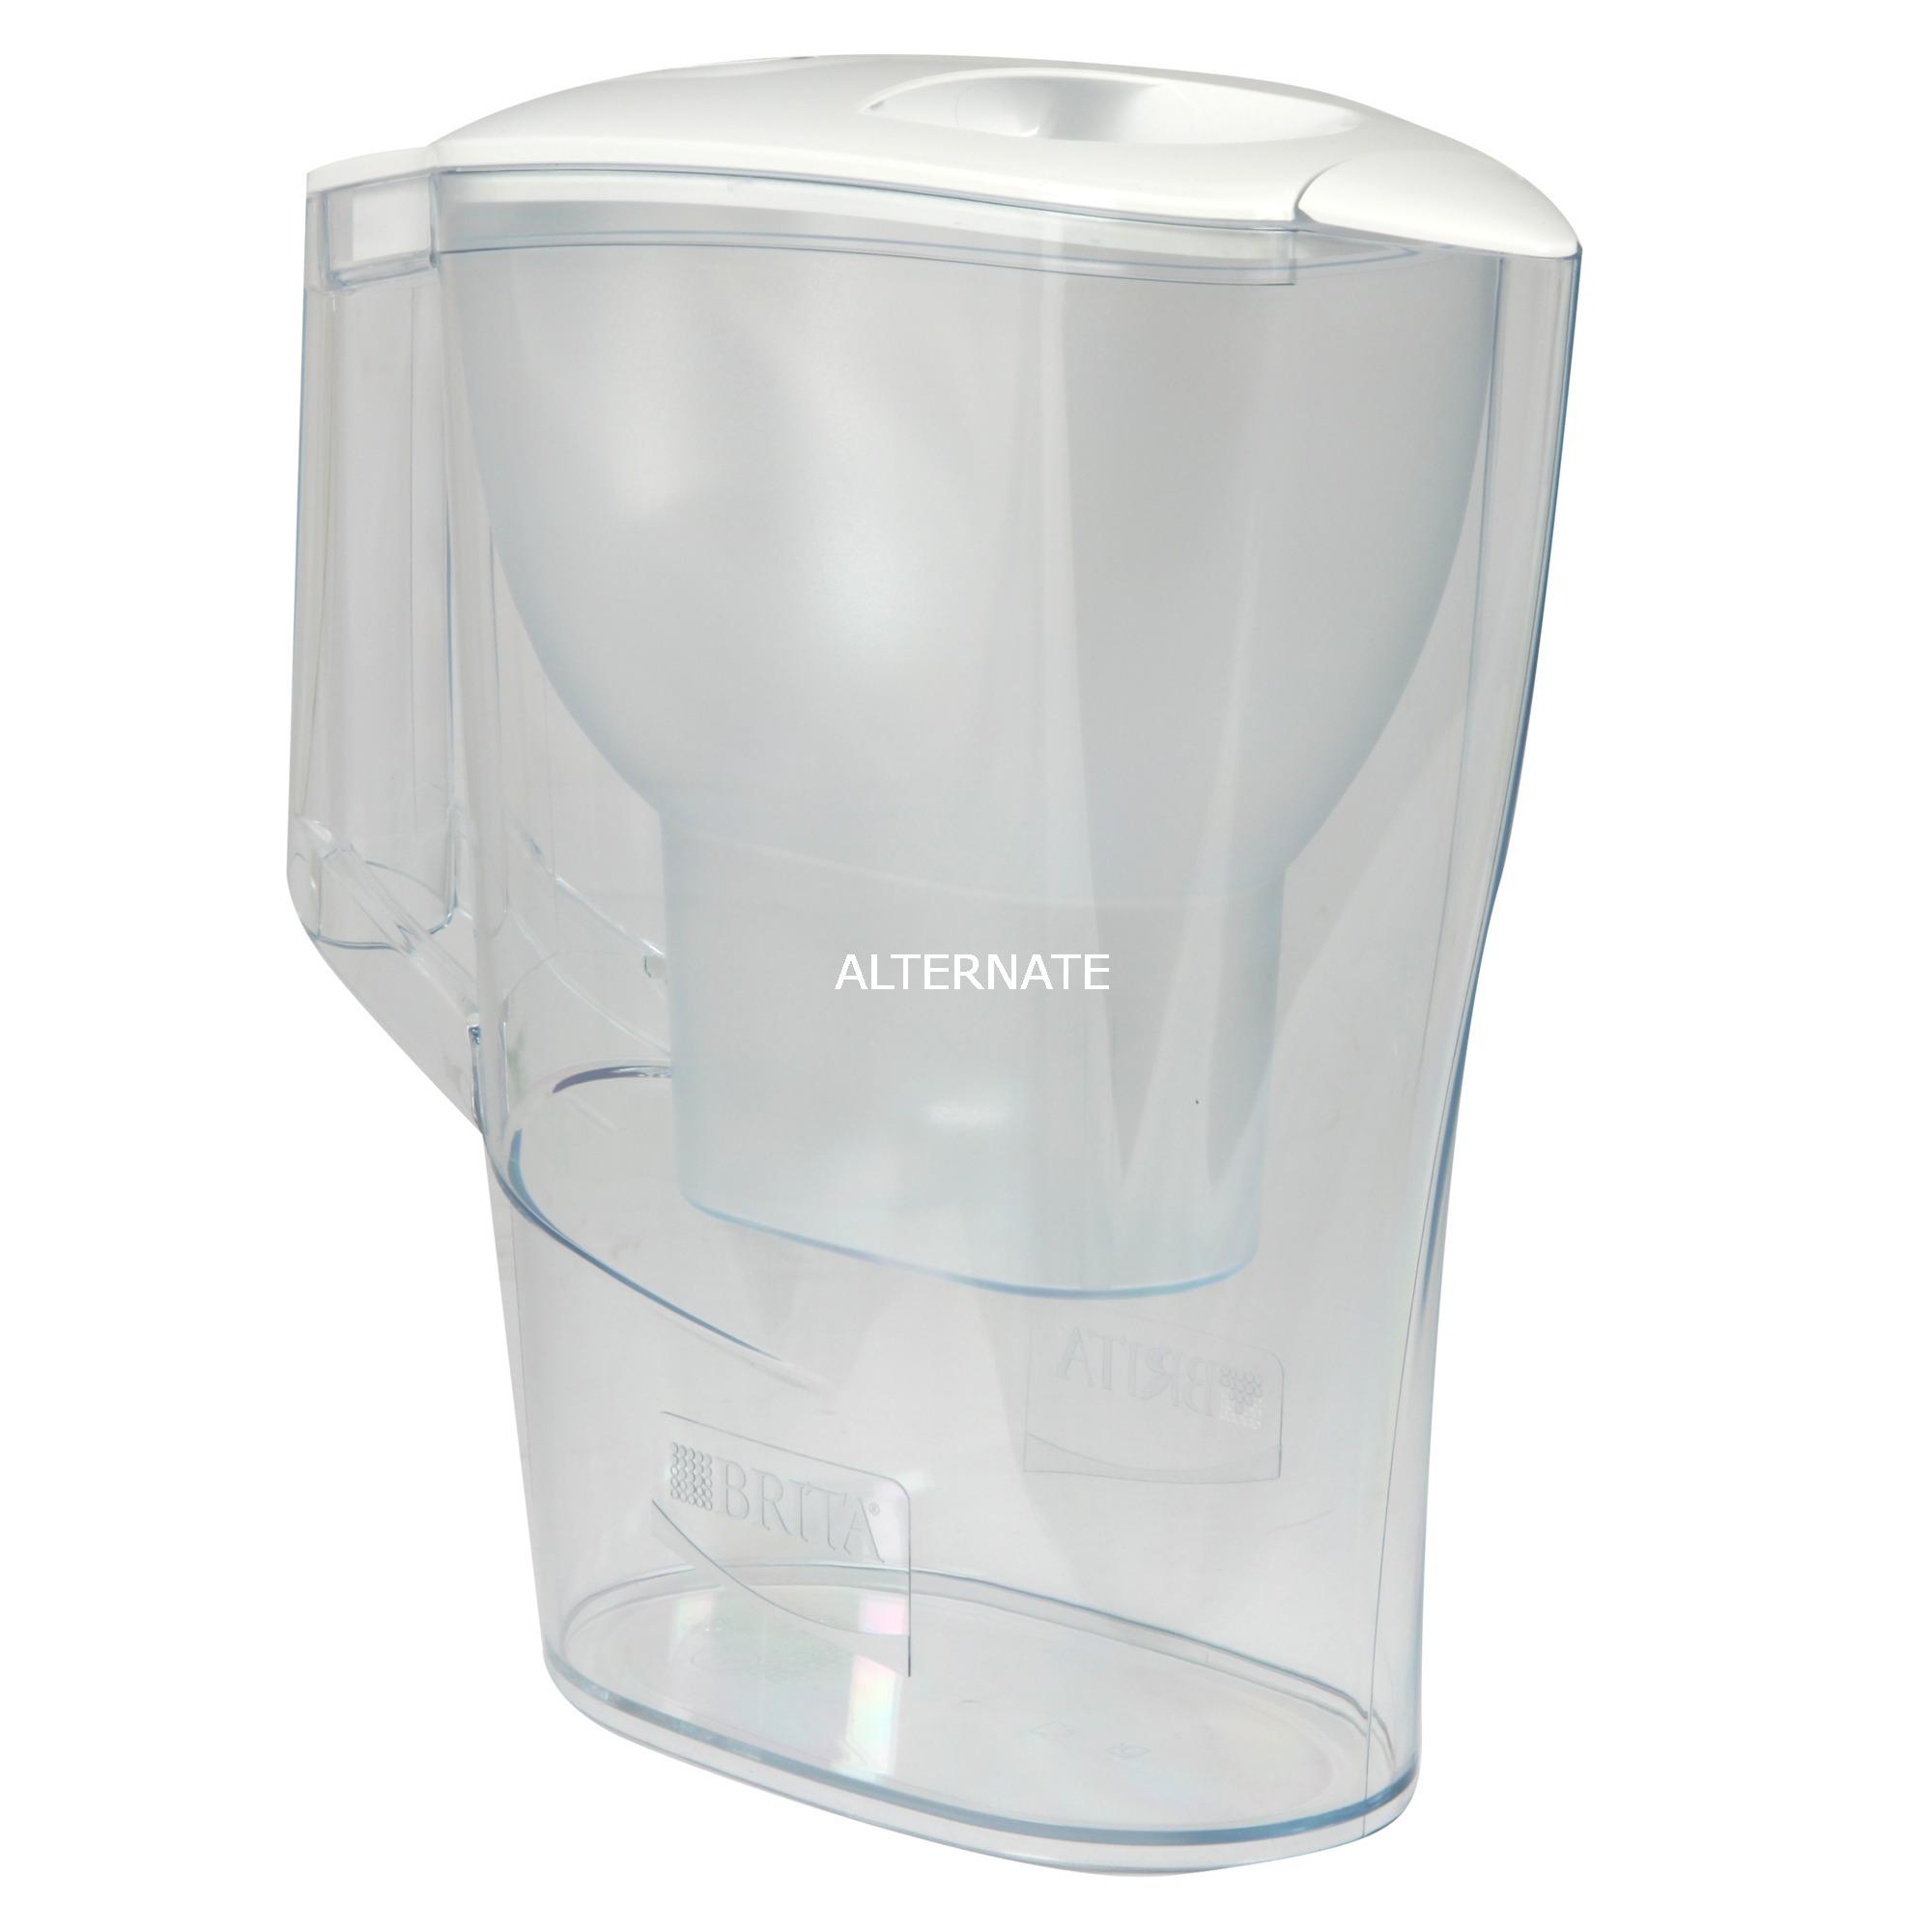 Aluna Cool Maxtra+ wh Filtro de agua para jarra Transparente, Blanco 2,4 L